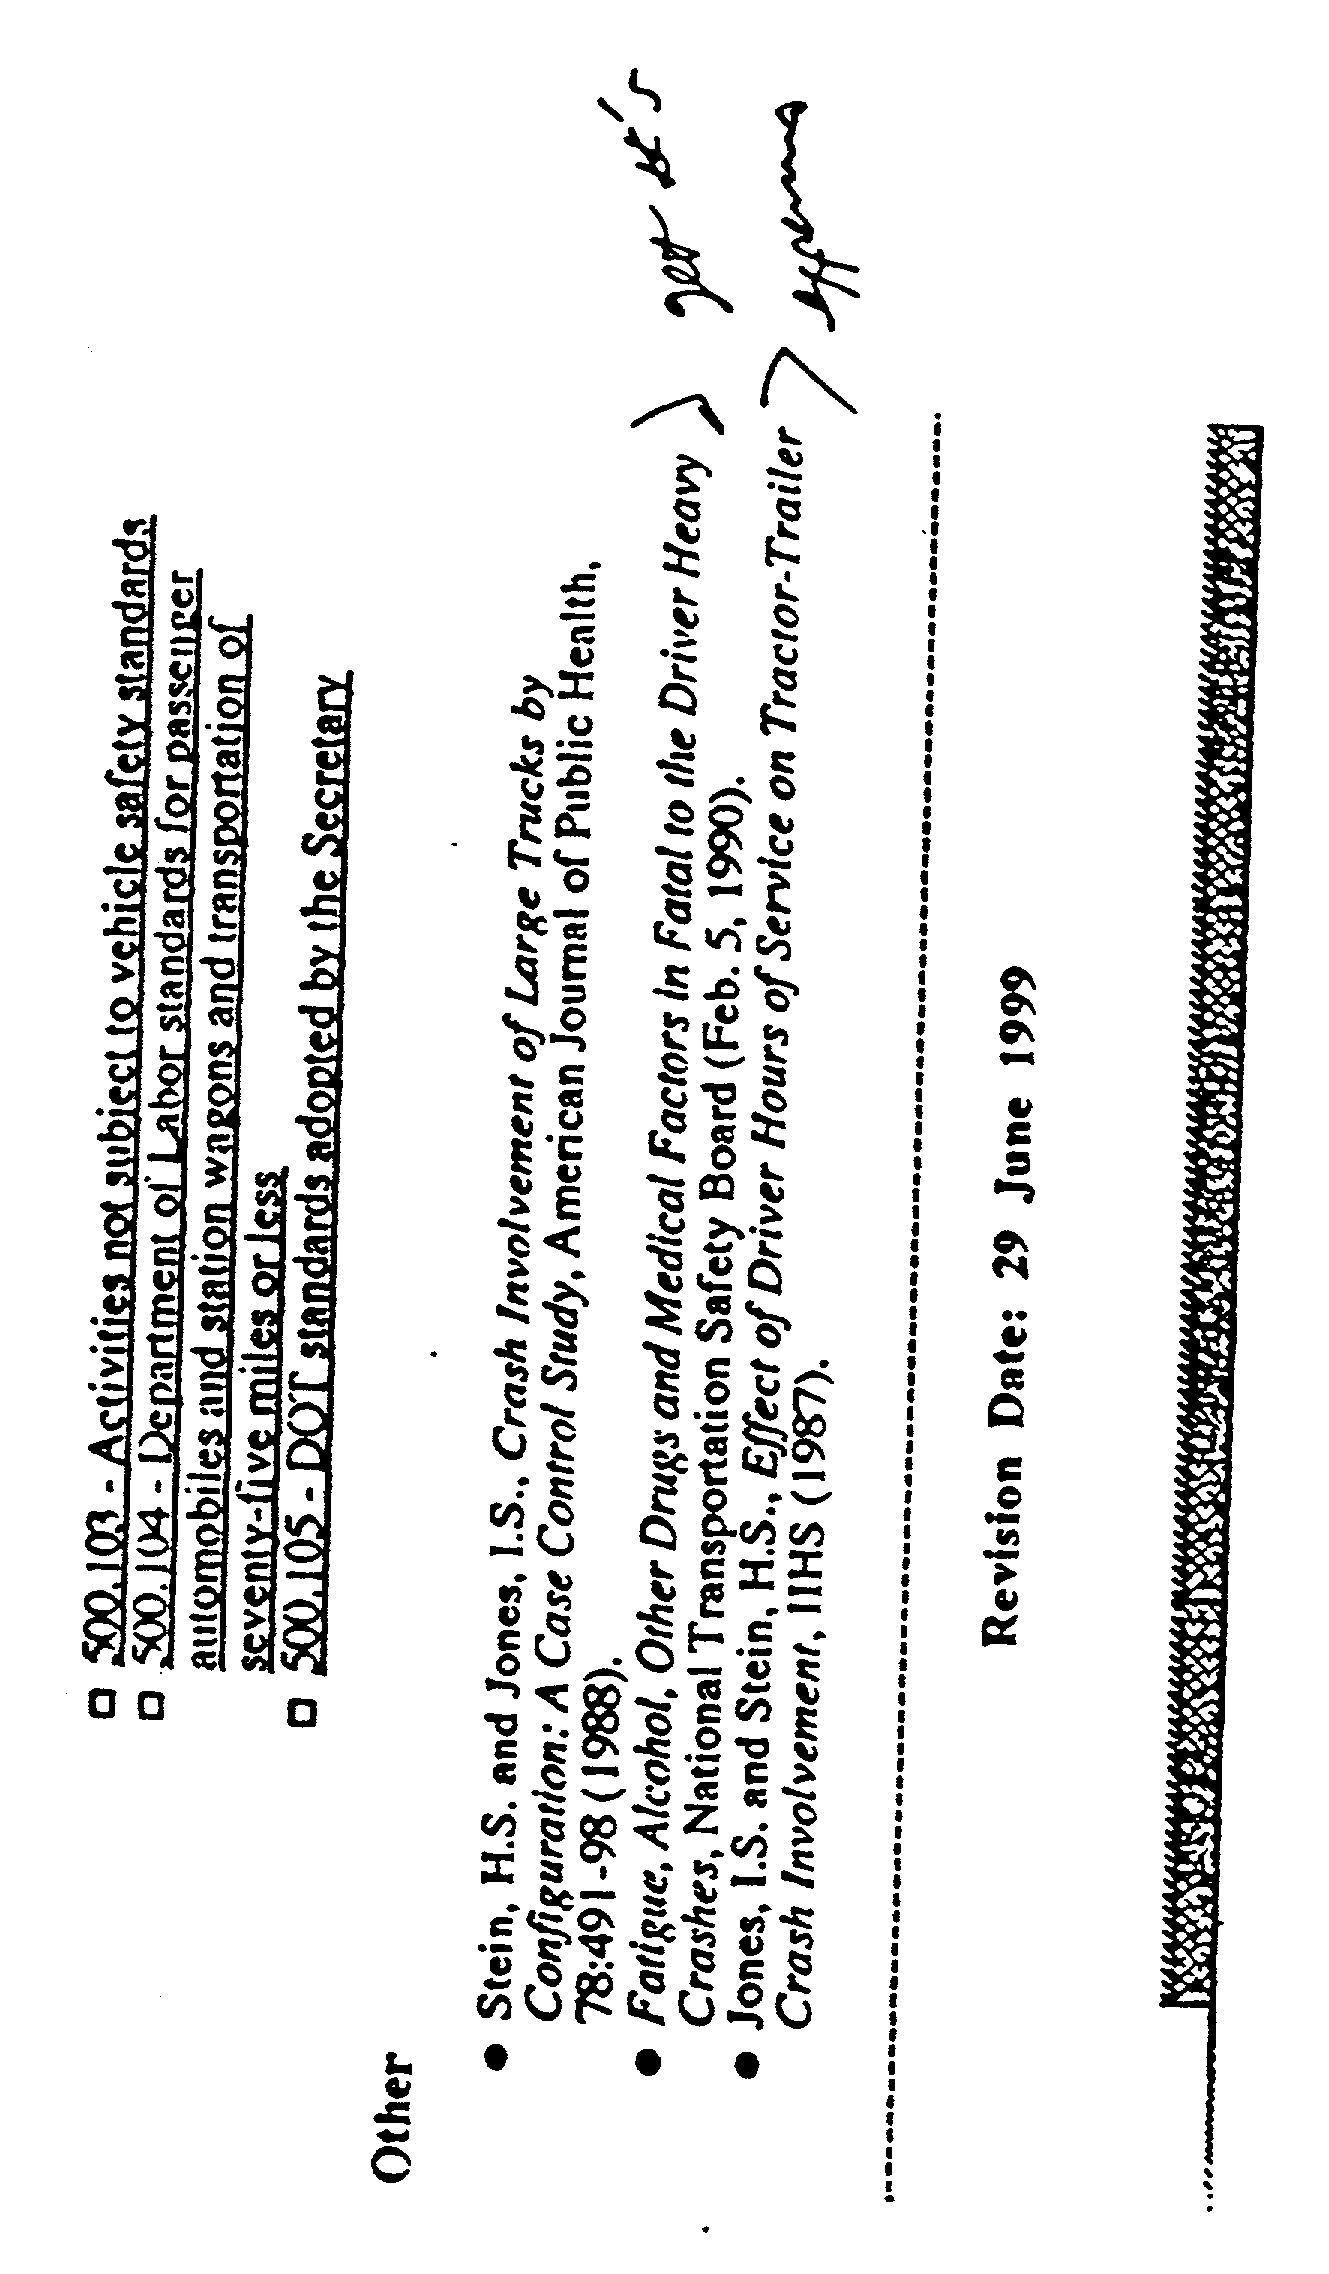 Figure US20020105438A1-20020808-P00033